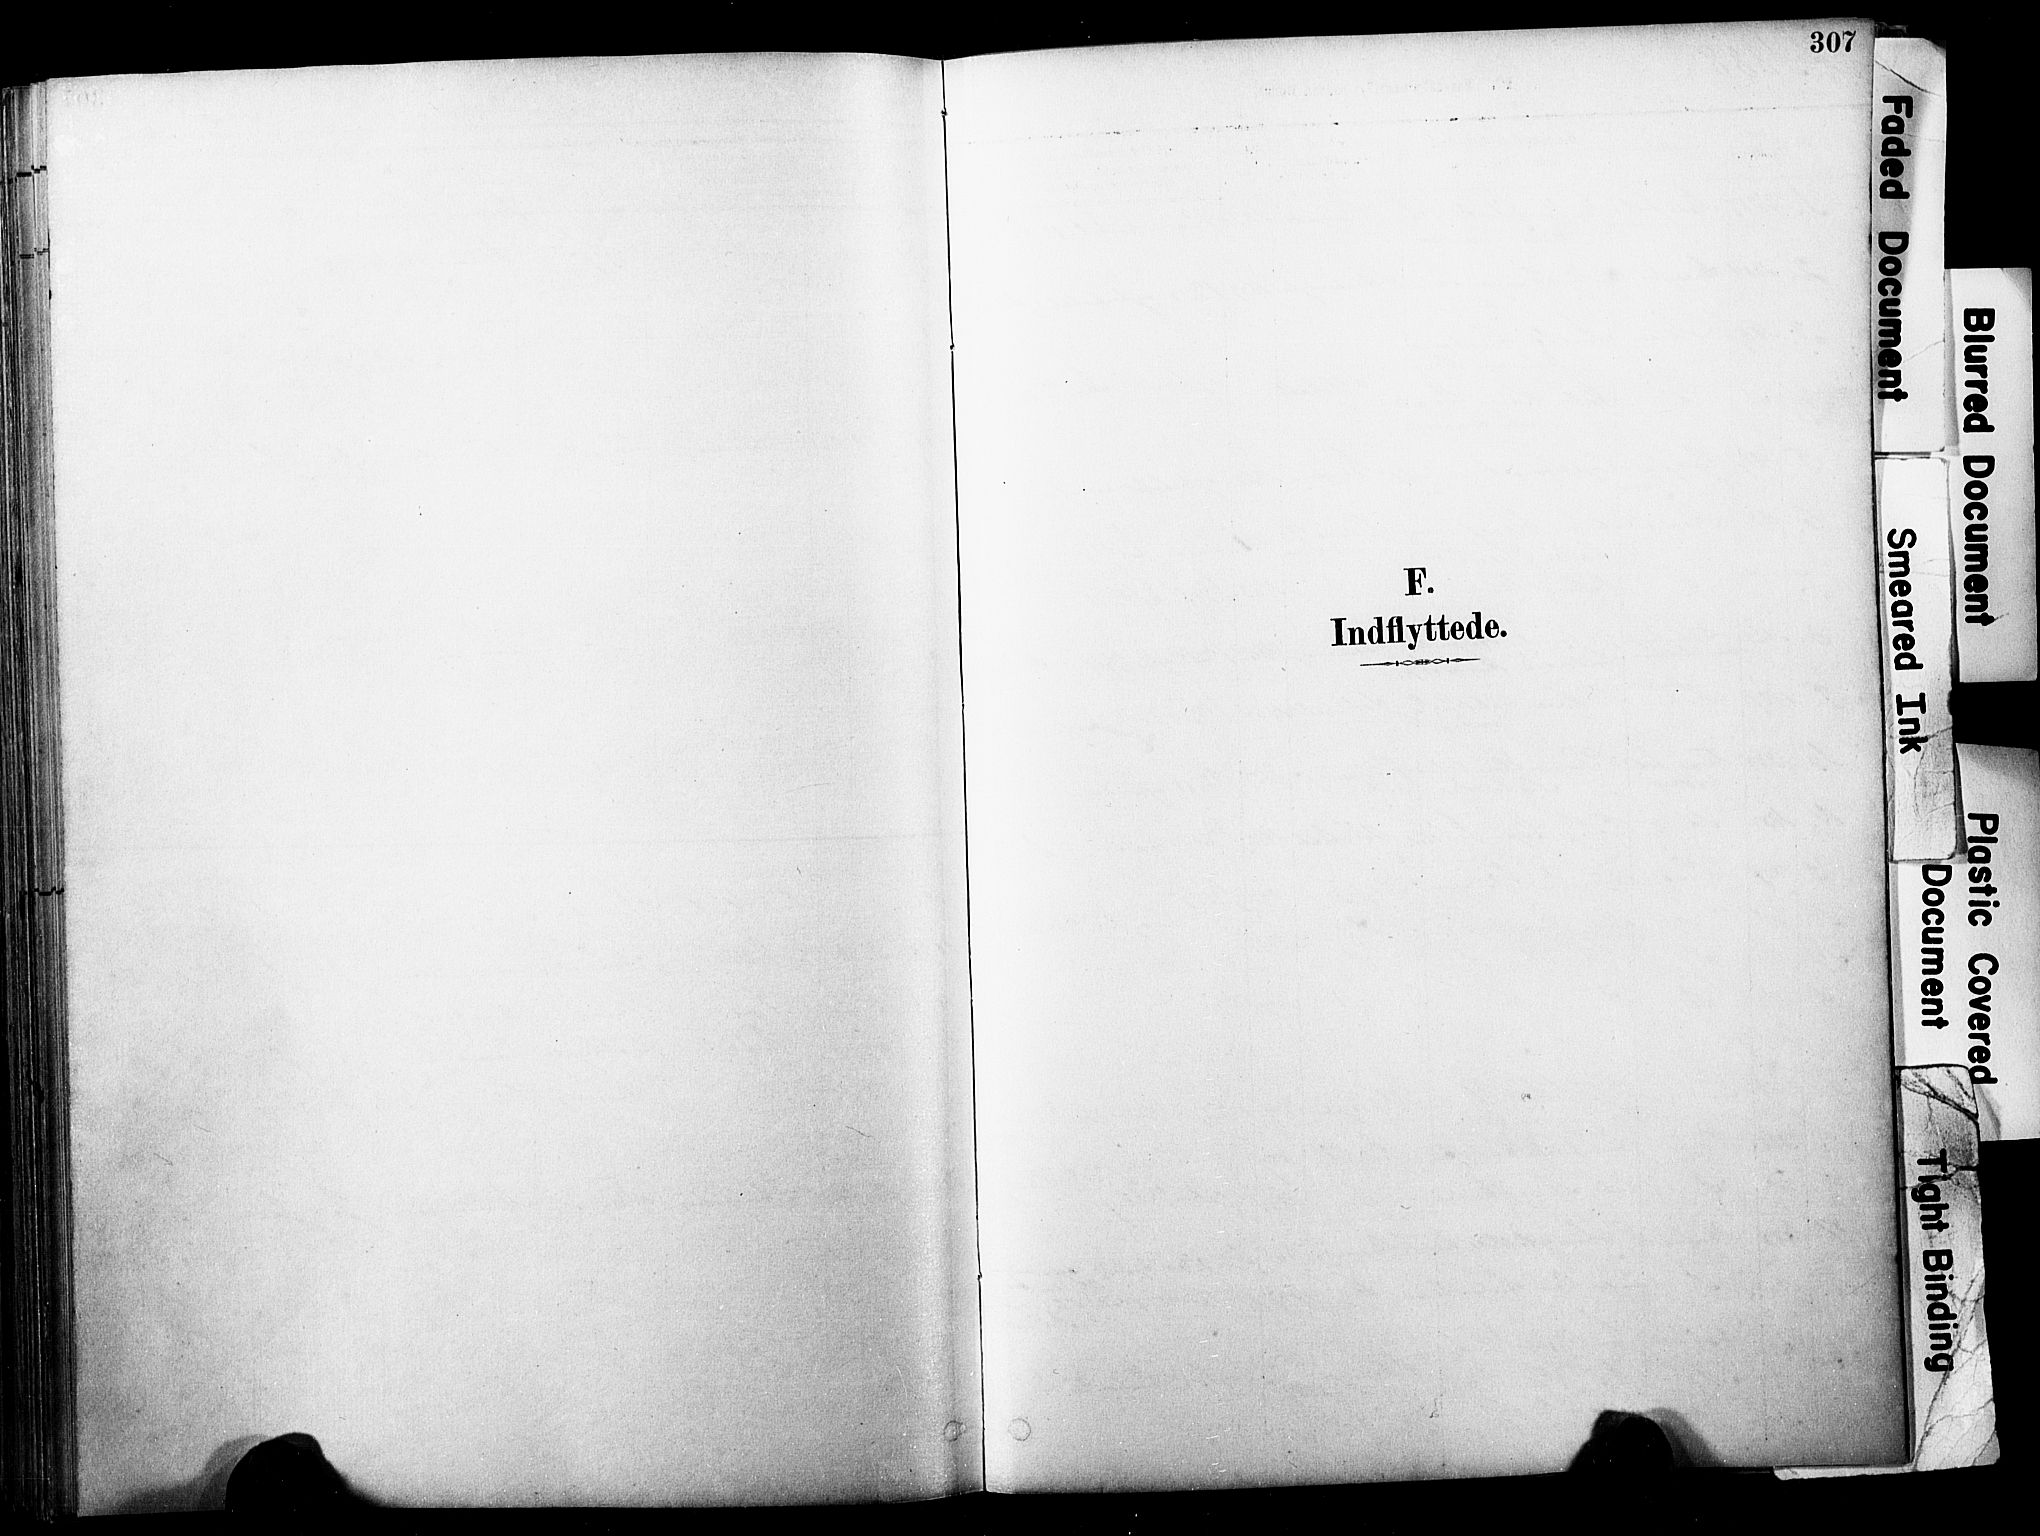 SAKO, Horten kirkebøker, F/Fa/L0004: Parish register (official) no. 4, 1888-1895, p. 307